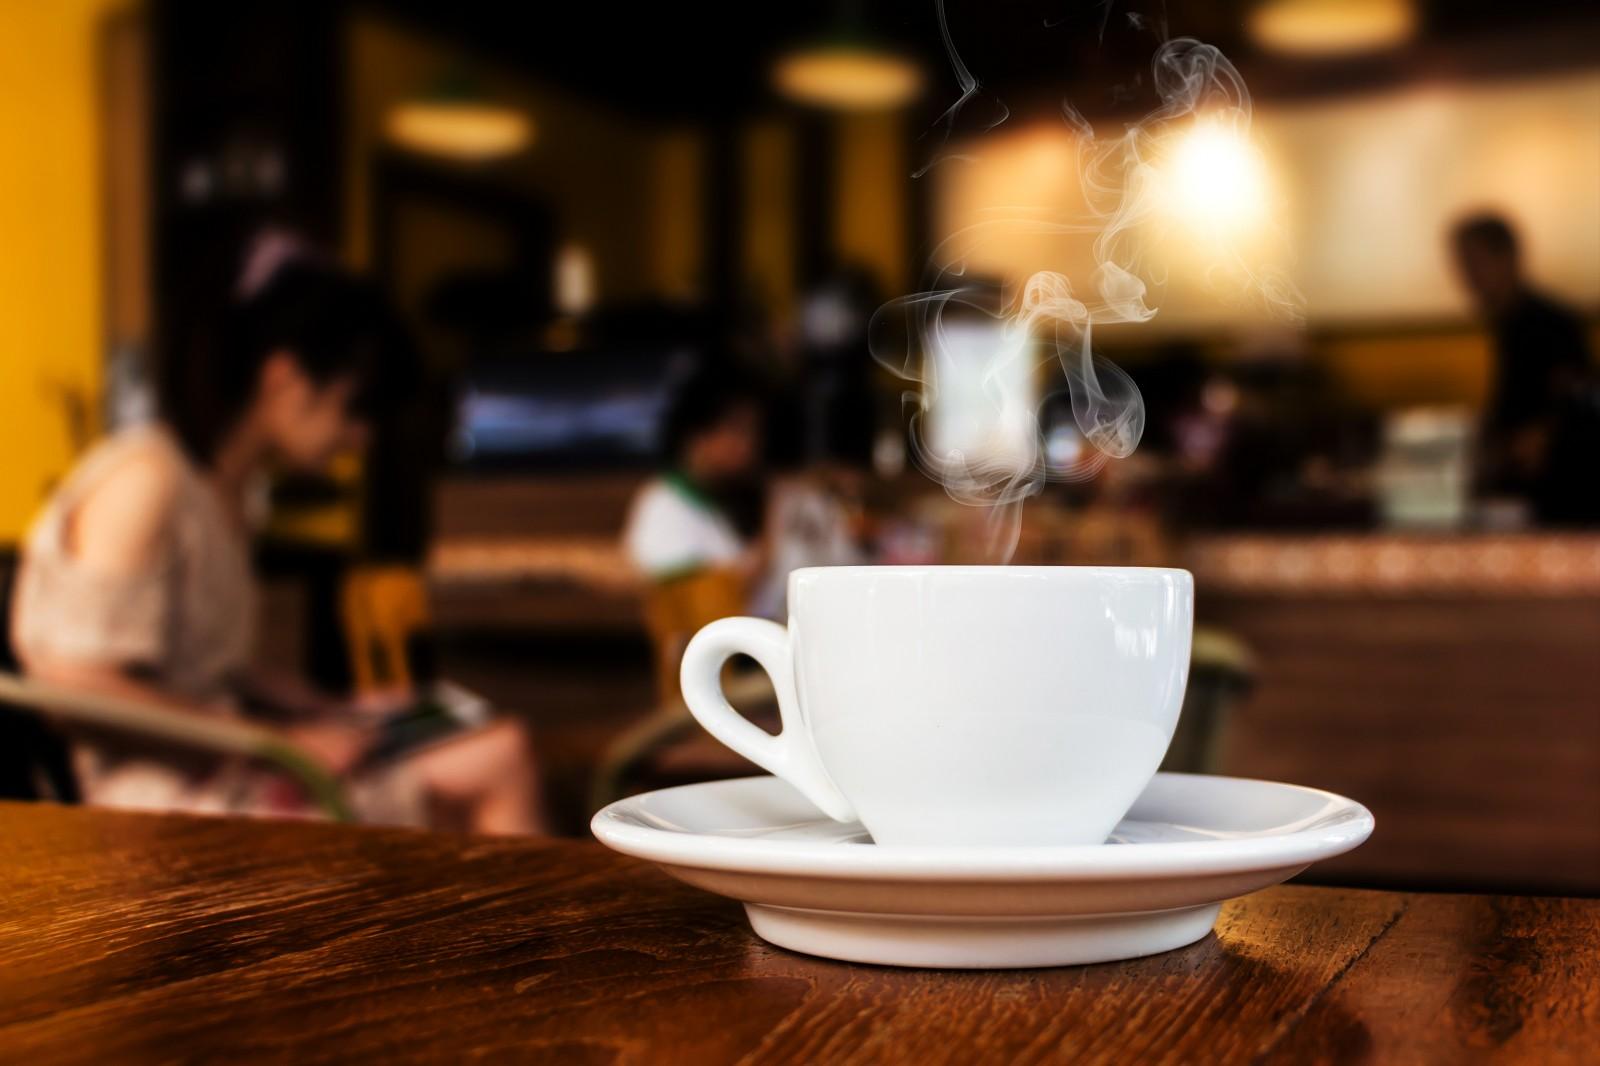 Coffee table cafe mashpee